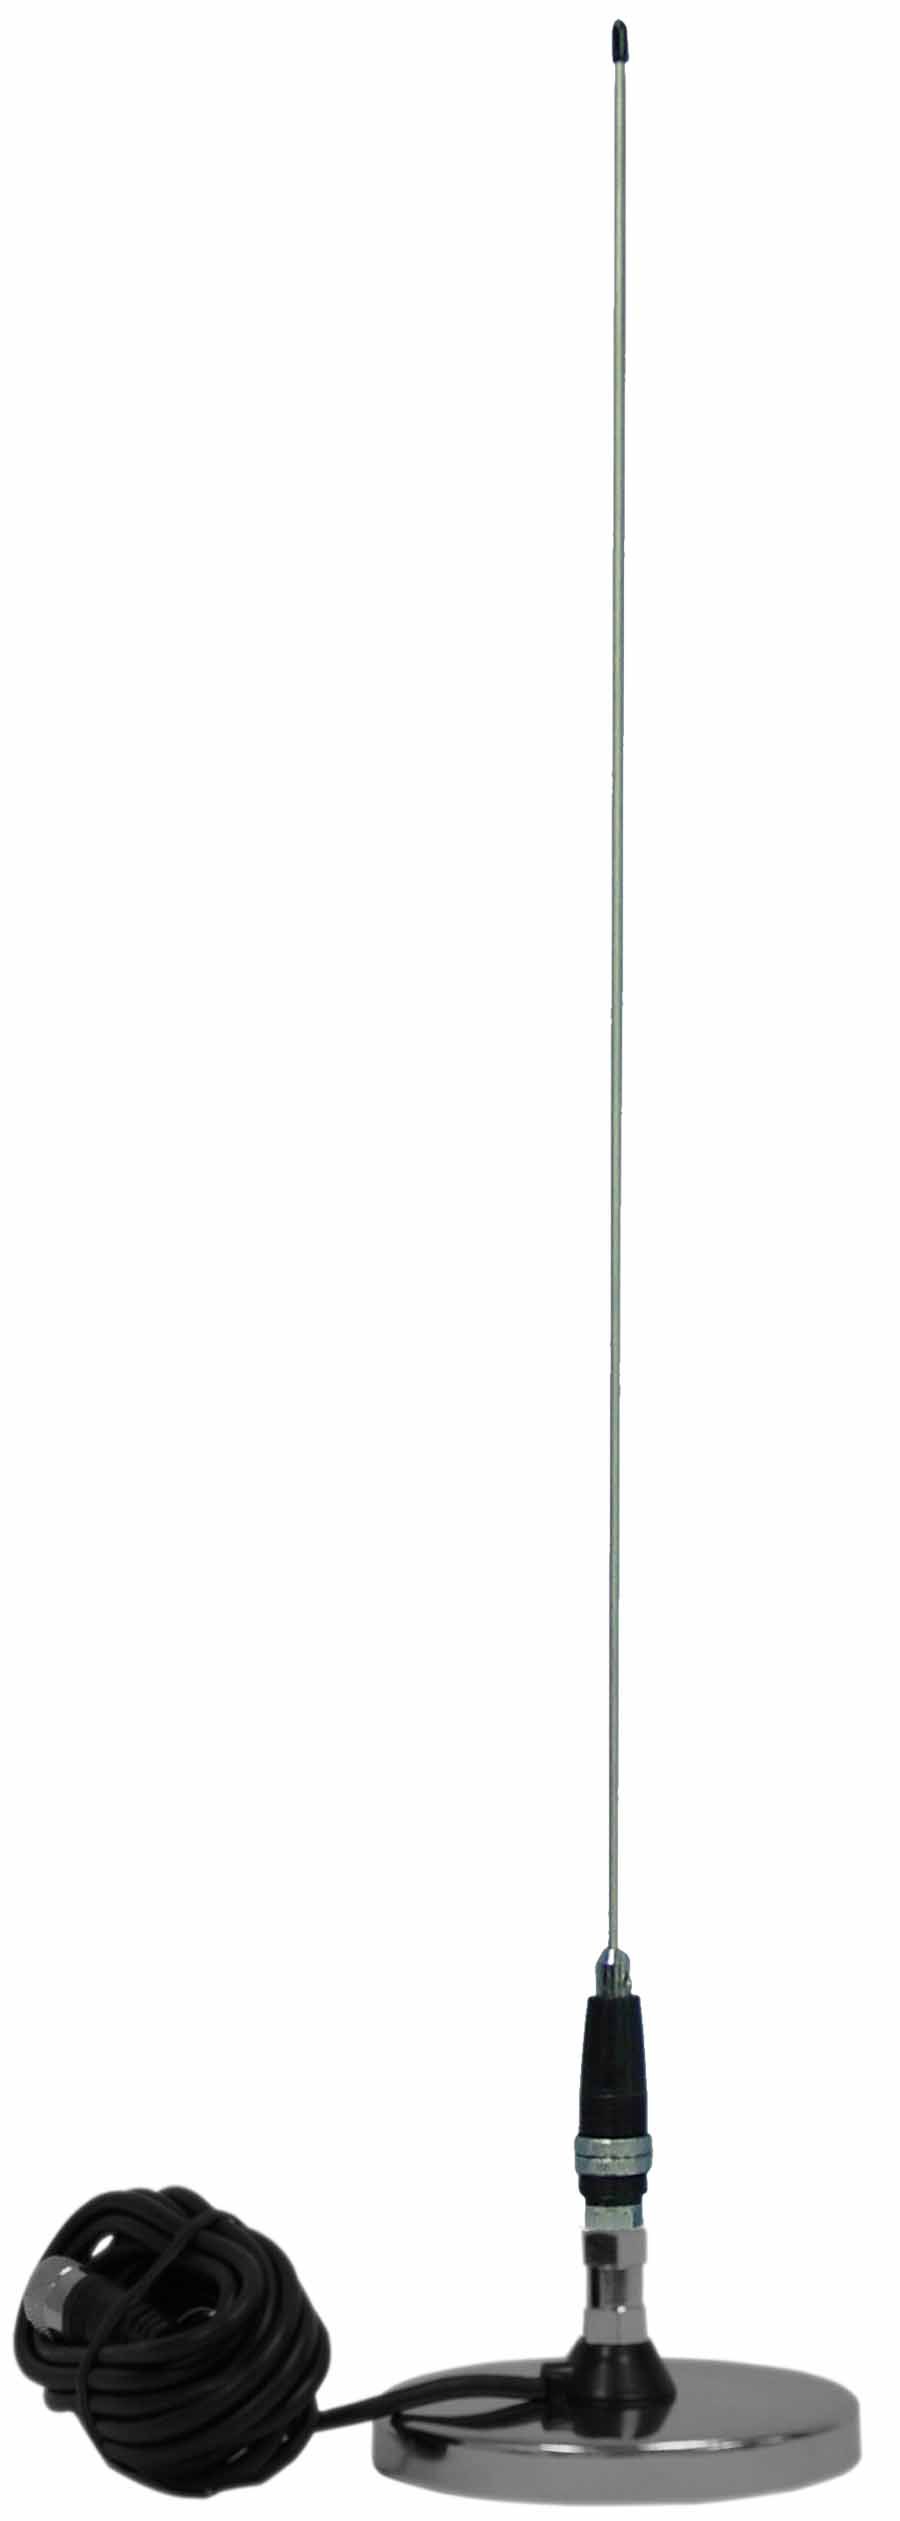 "JBC112-3600 - ProComm Kwik Tune 3' CB Antenna  with 3"" Magnet & 12' Coax"